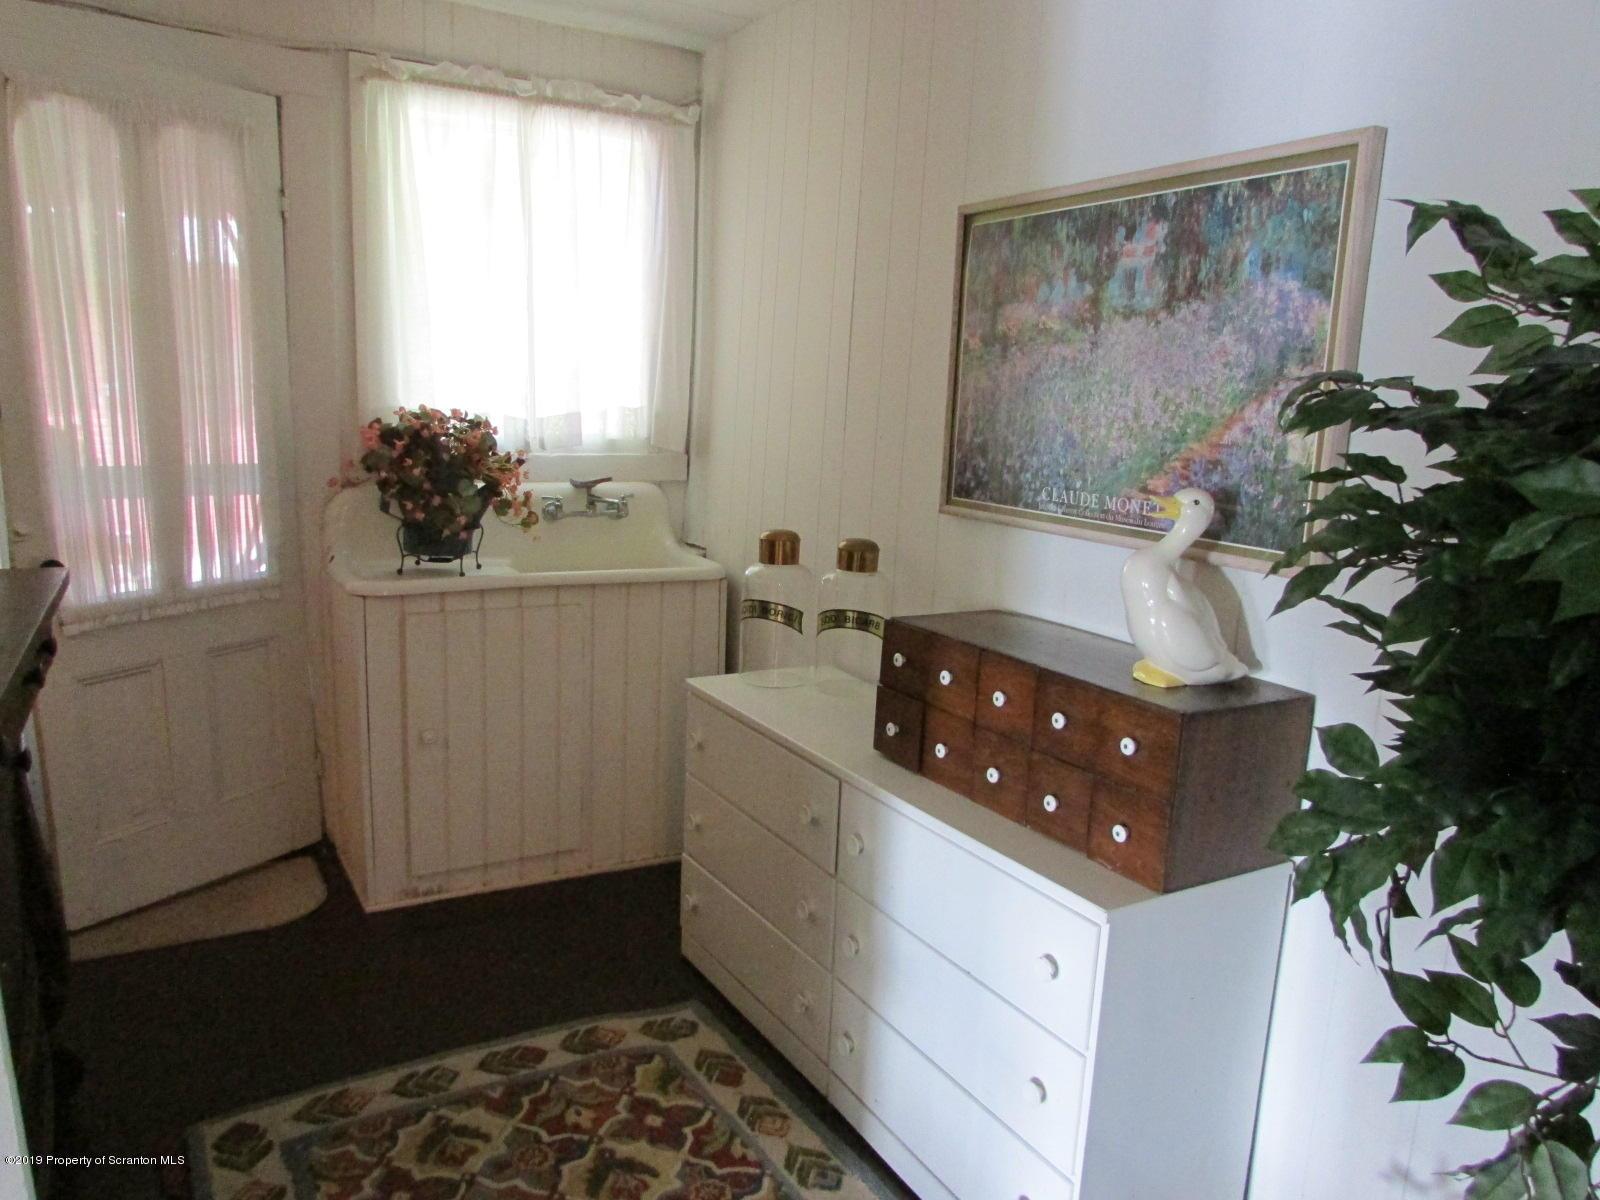 194 Heart Lake Road, Montrose, Pennsylvania 18801, 4 Bedrooms Bedrooms, 6 Rooms Rooms,2 BathroomsBathrooms,Single Family,For Sale,Heart Lake Road,19-4131